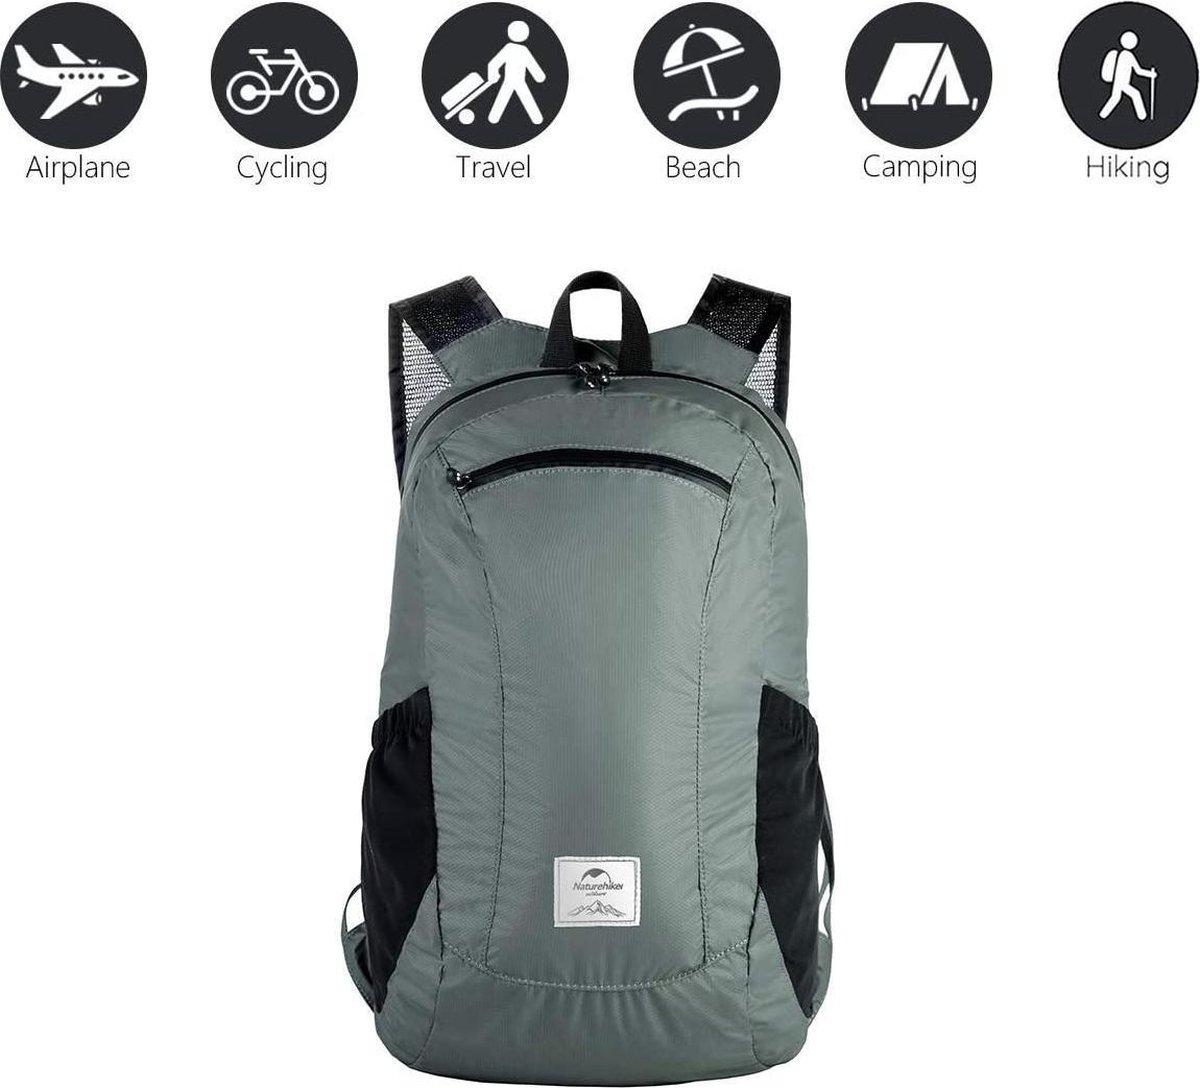 Opvouwbare Backpack / Daypack - Water Bestendig - Outdoor - Lichtgewicht - 18 Liter - Grijs